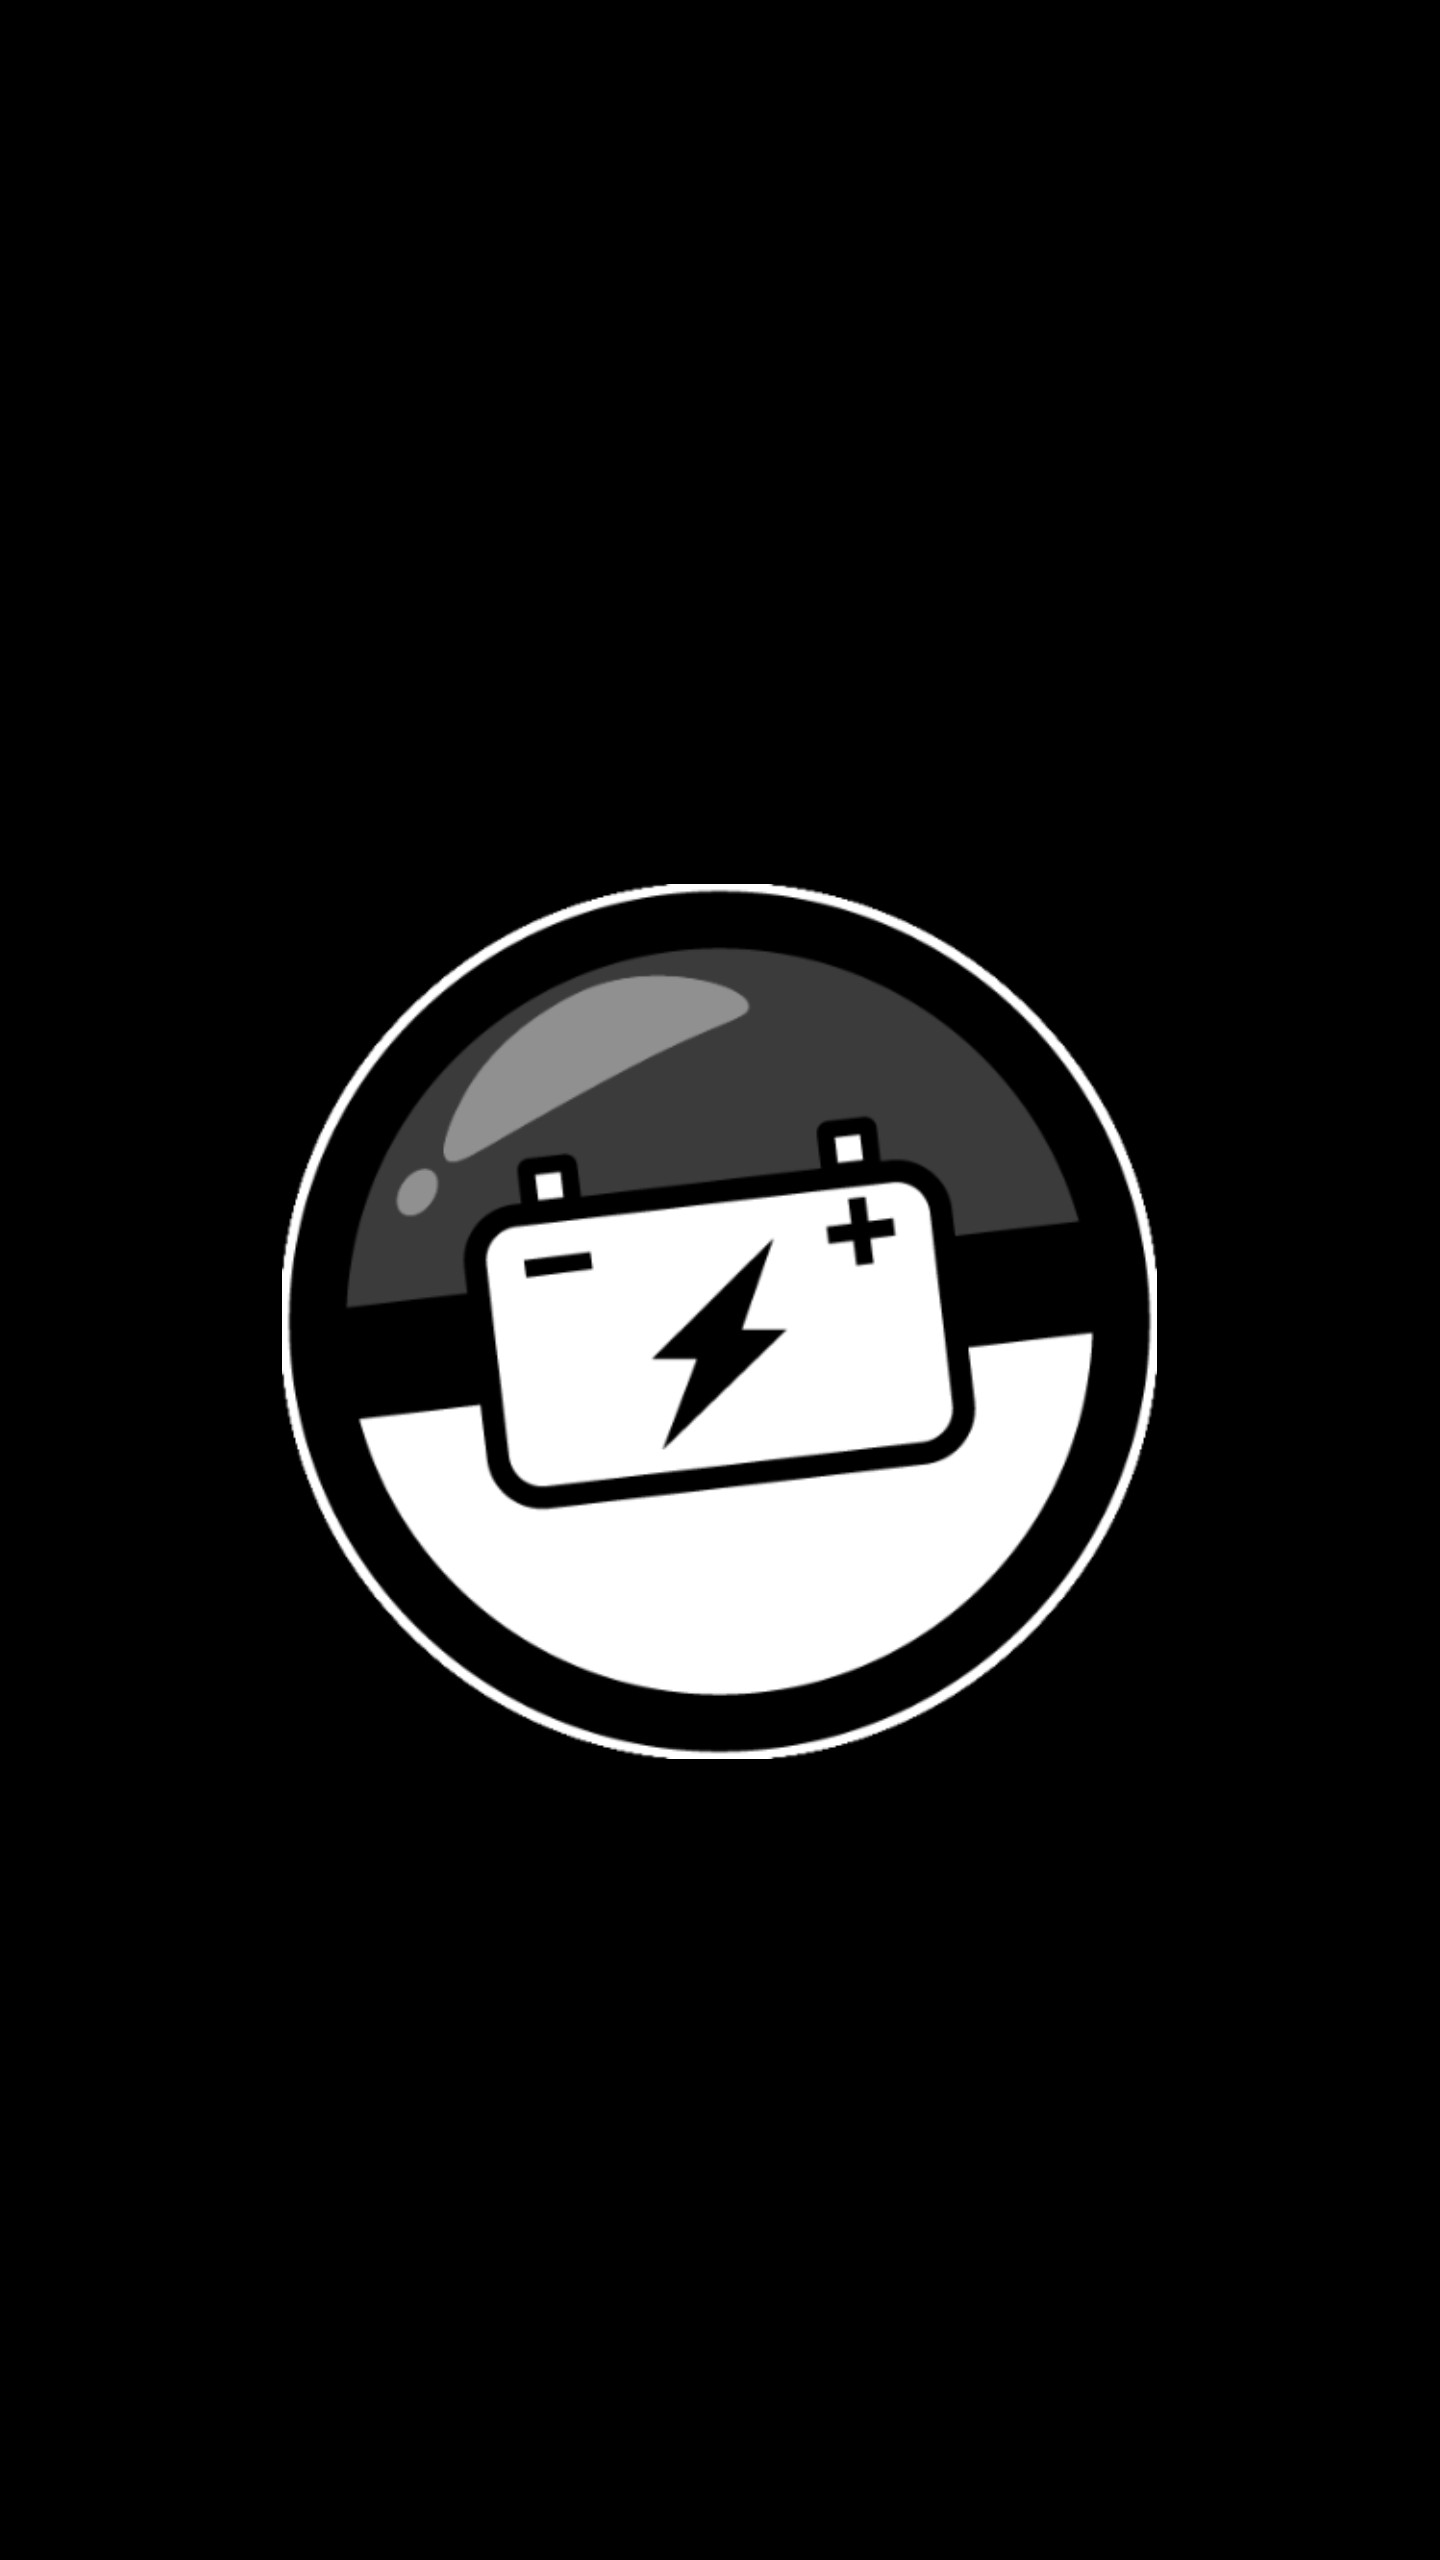 Battery Saver Pokemon Go Free